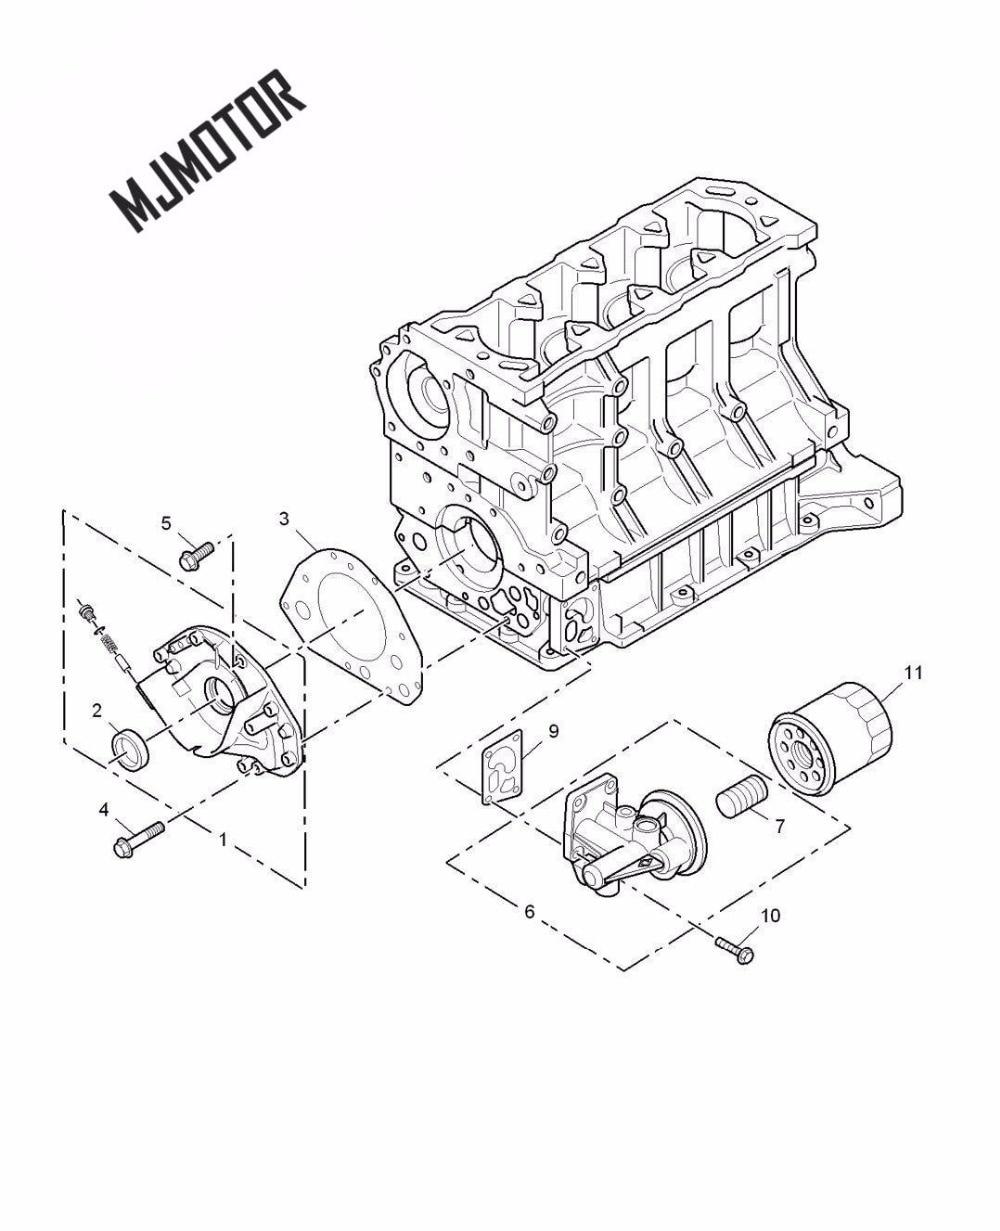 vw 2 0t fsi engine diagram wiring library 1 8t engine diagram oil pump automotive wiring [ 1000 x 1231 Pixel ]